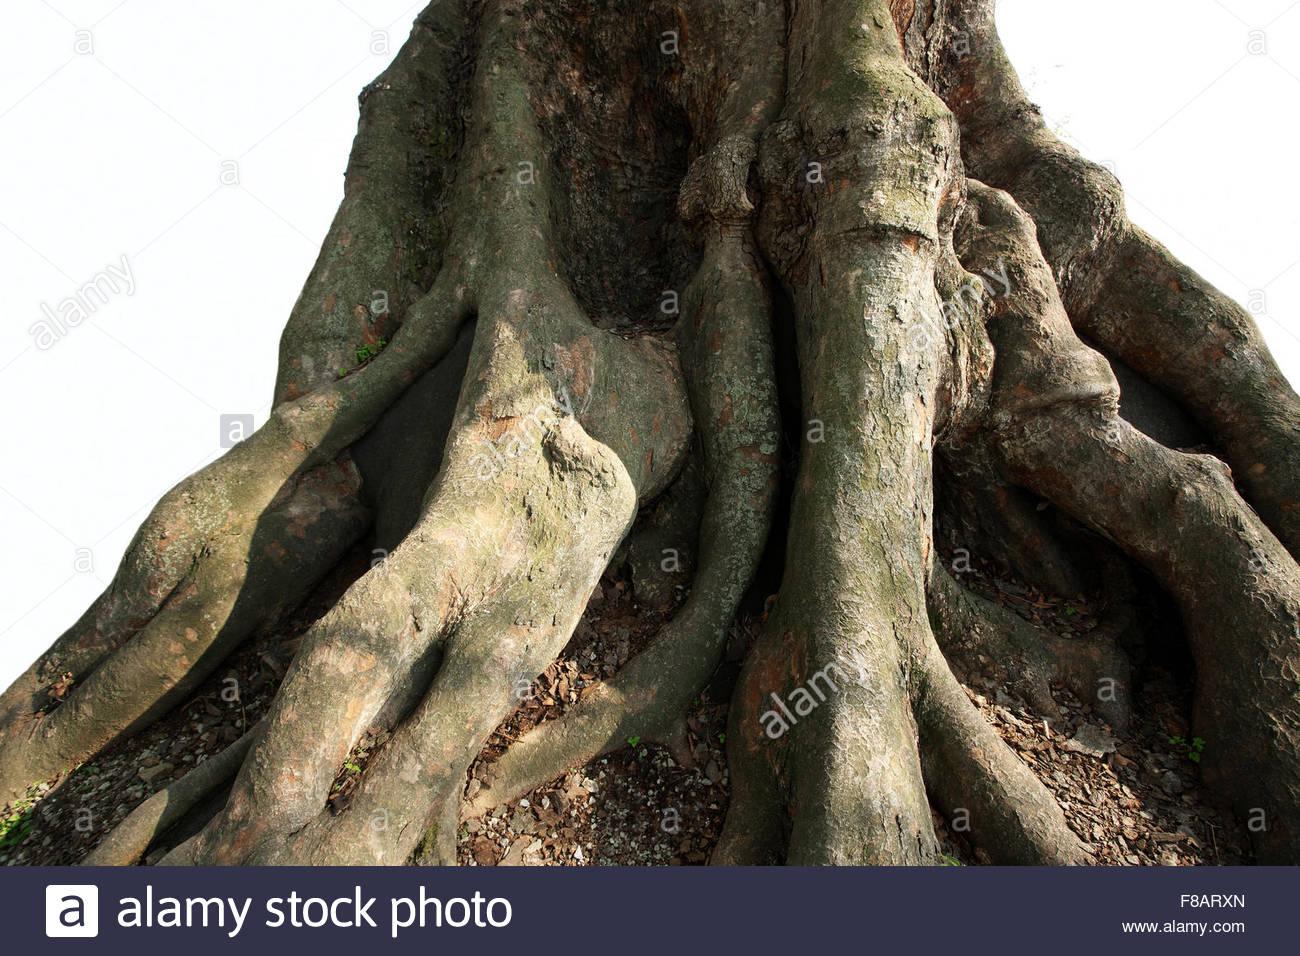 root of giant zelkova tree - Stock Image